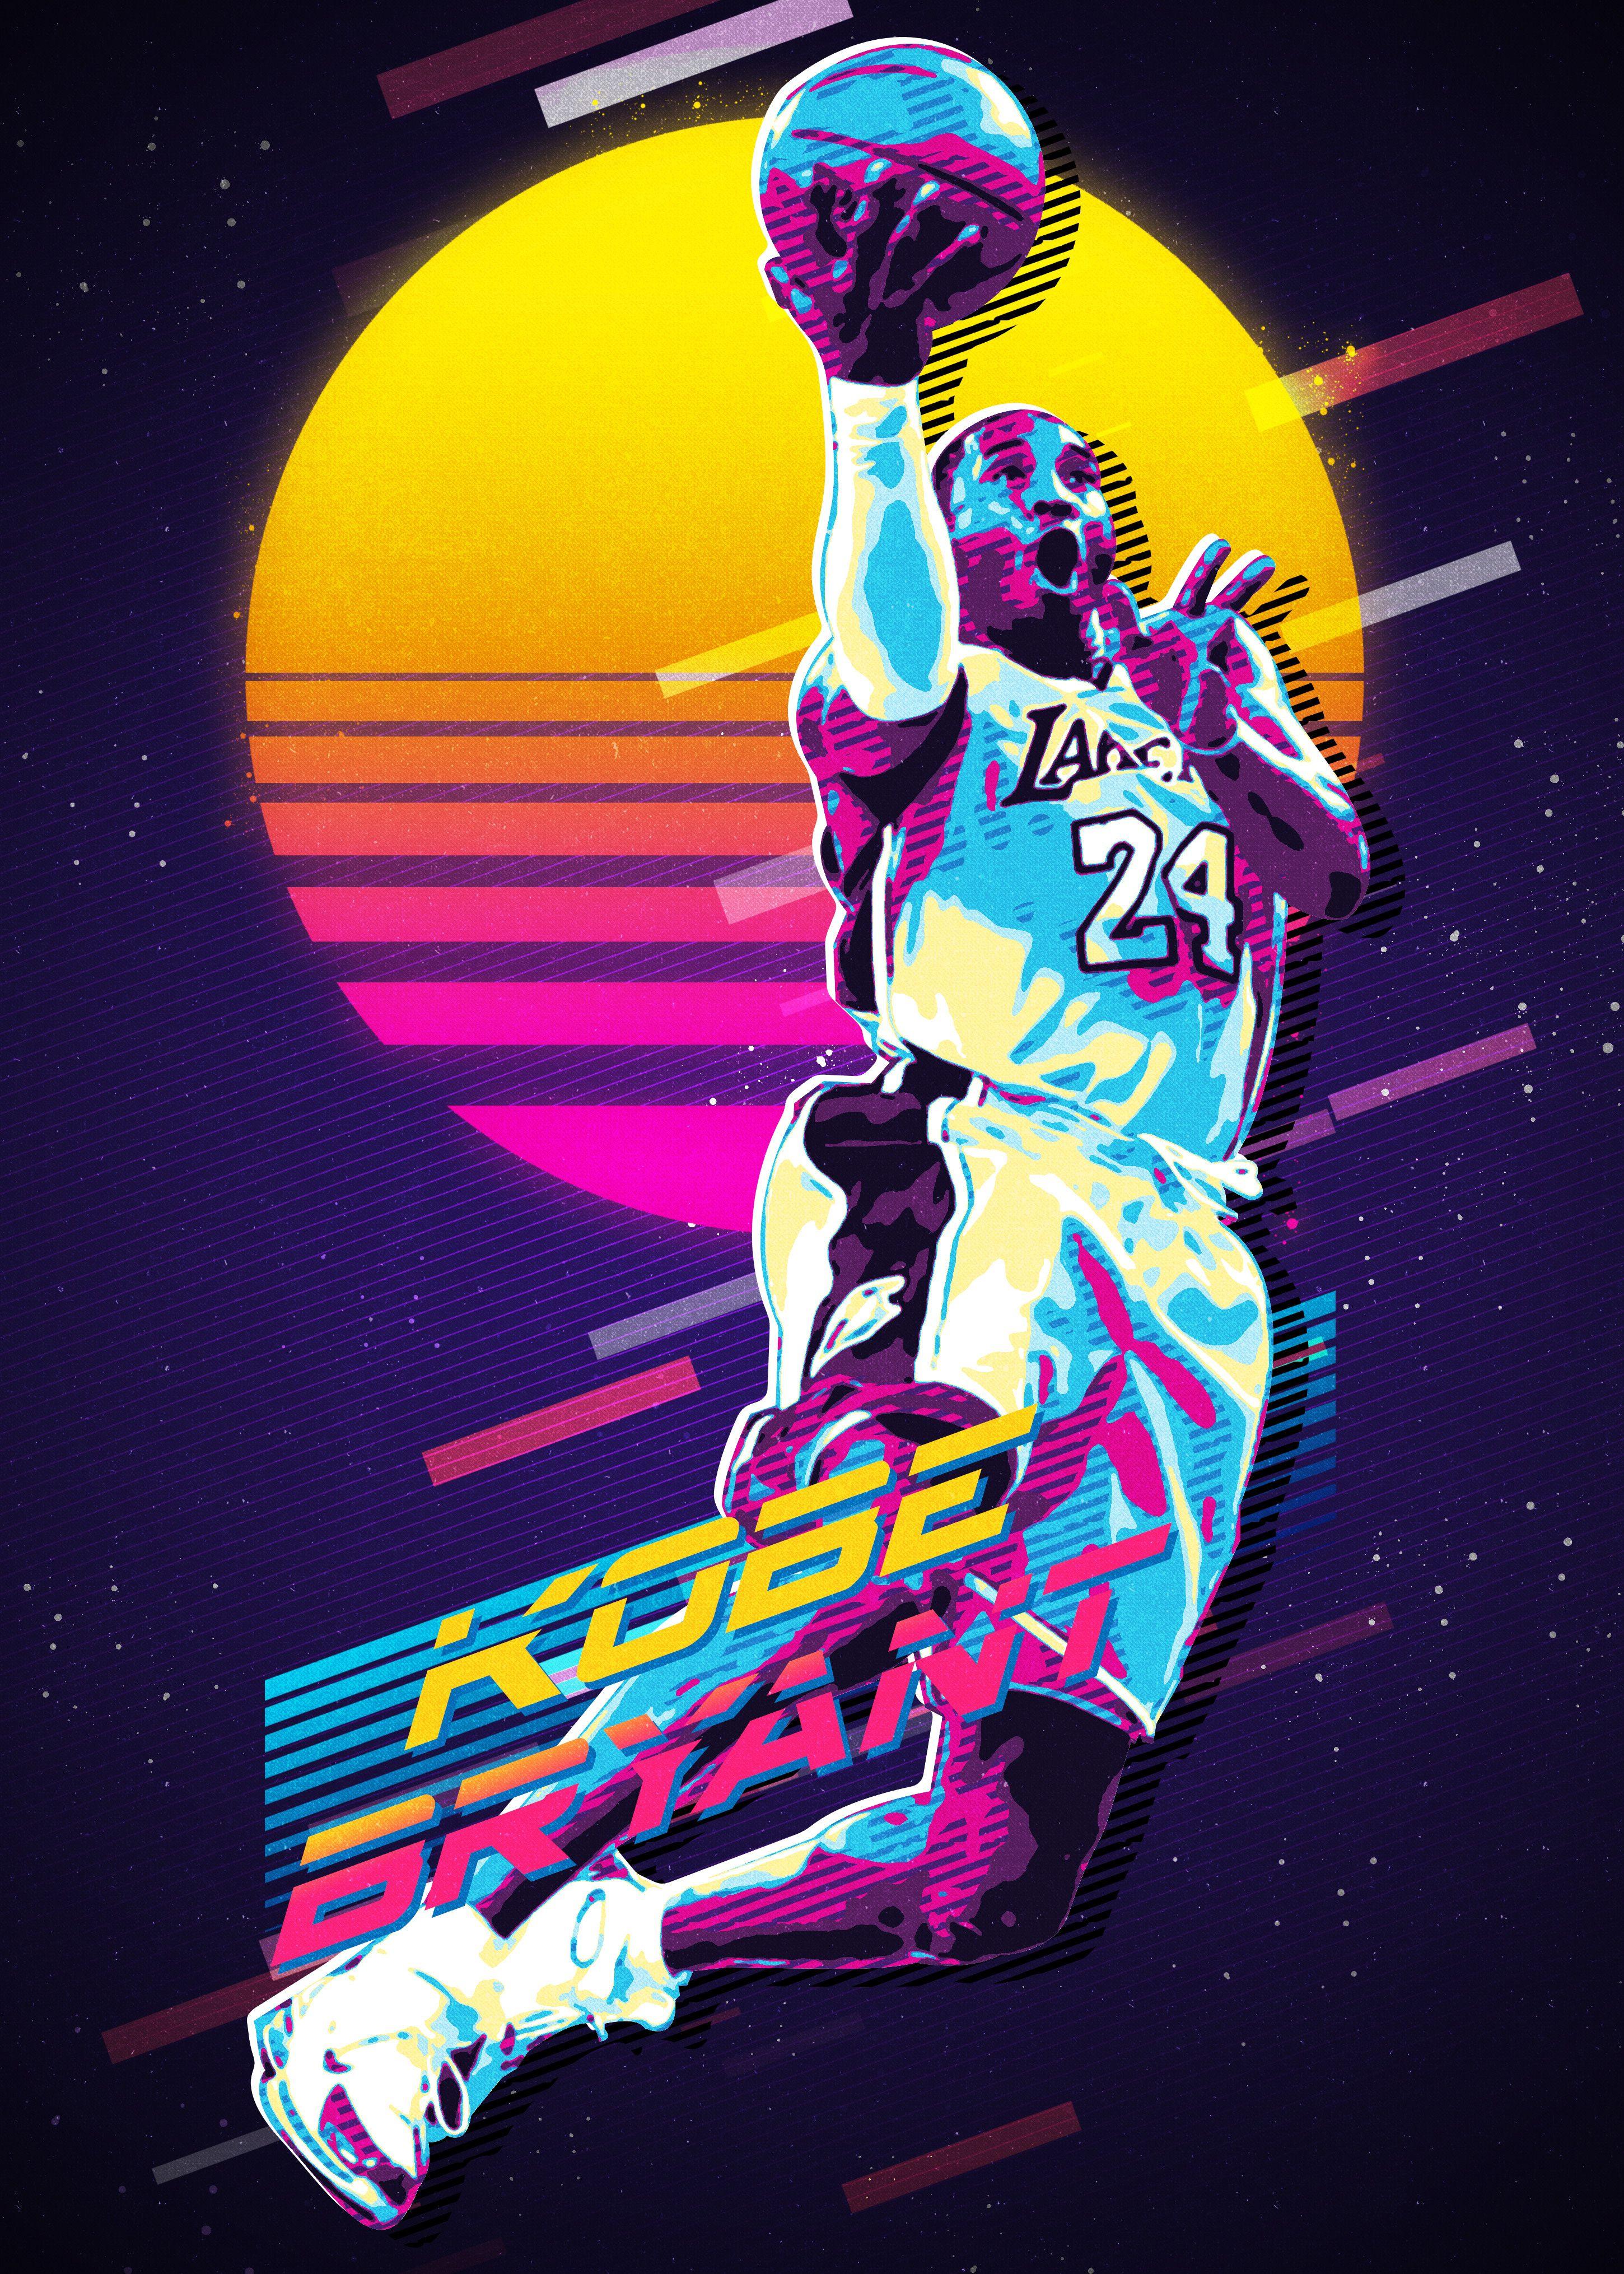 Kobe Retro in 2020 Lakers kobe Kobe bryant poster Kobe bryant 2900x4060